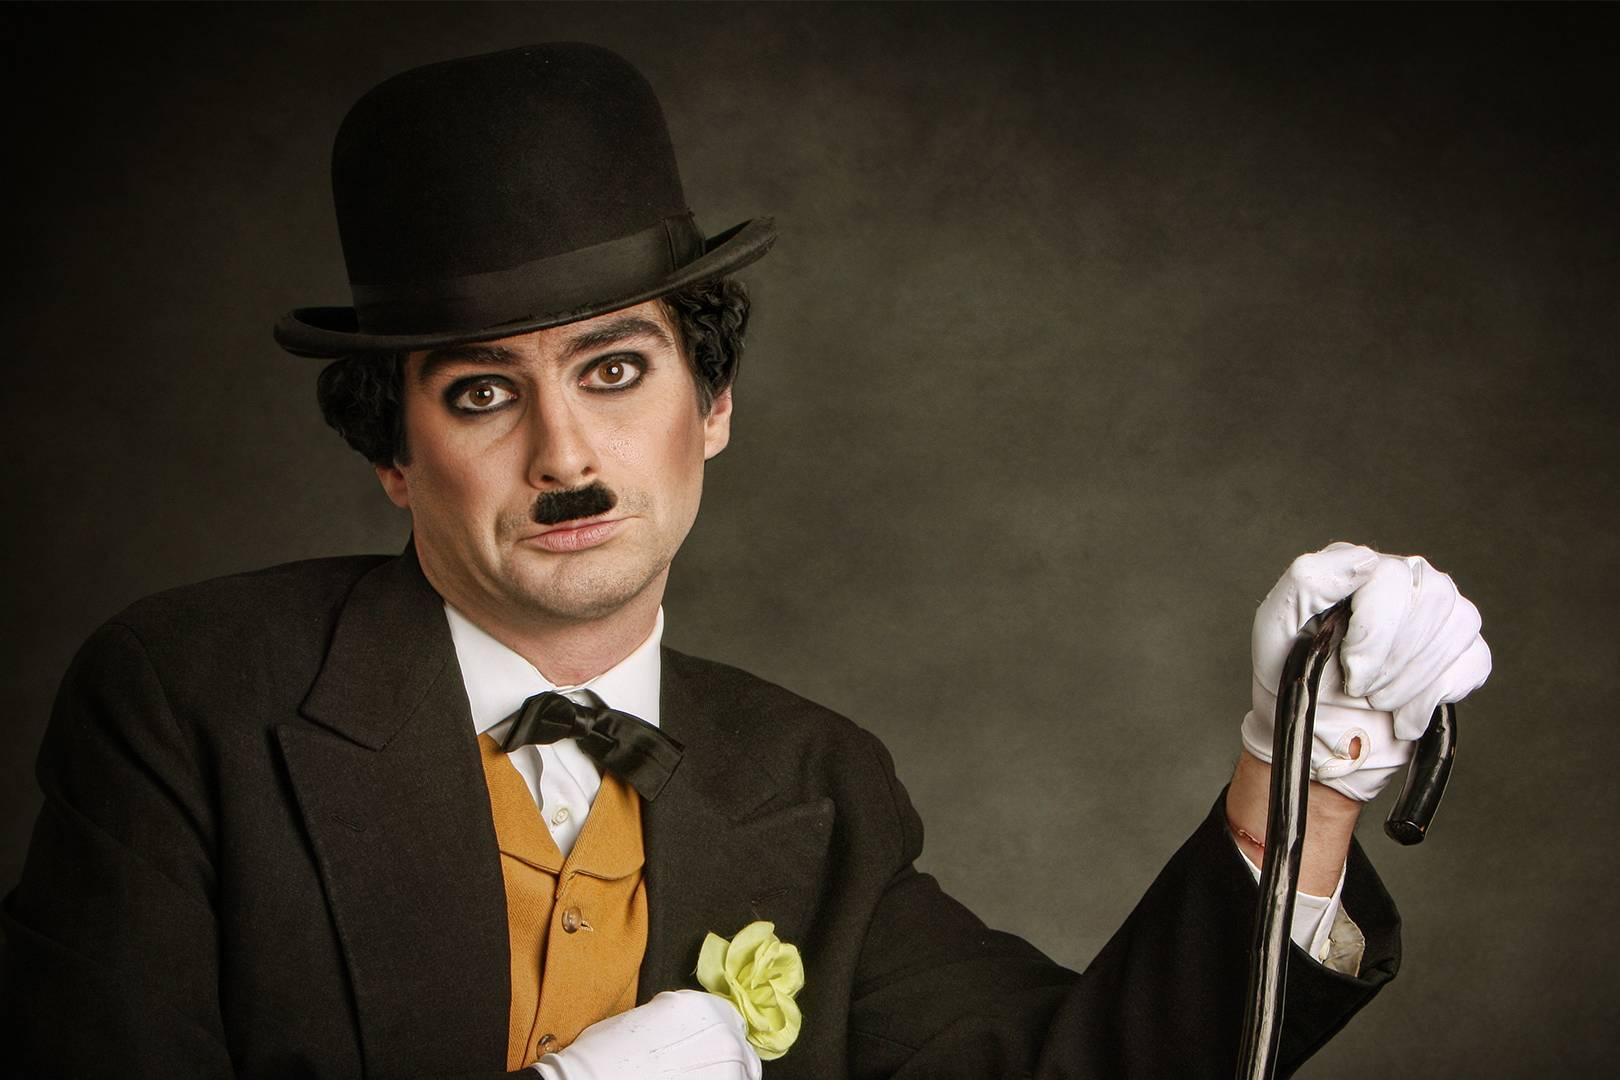 Uomo che imita Charlie Chaplin